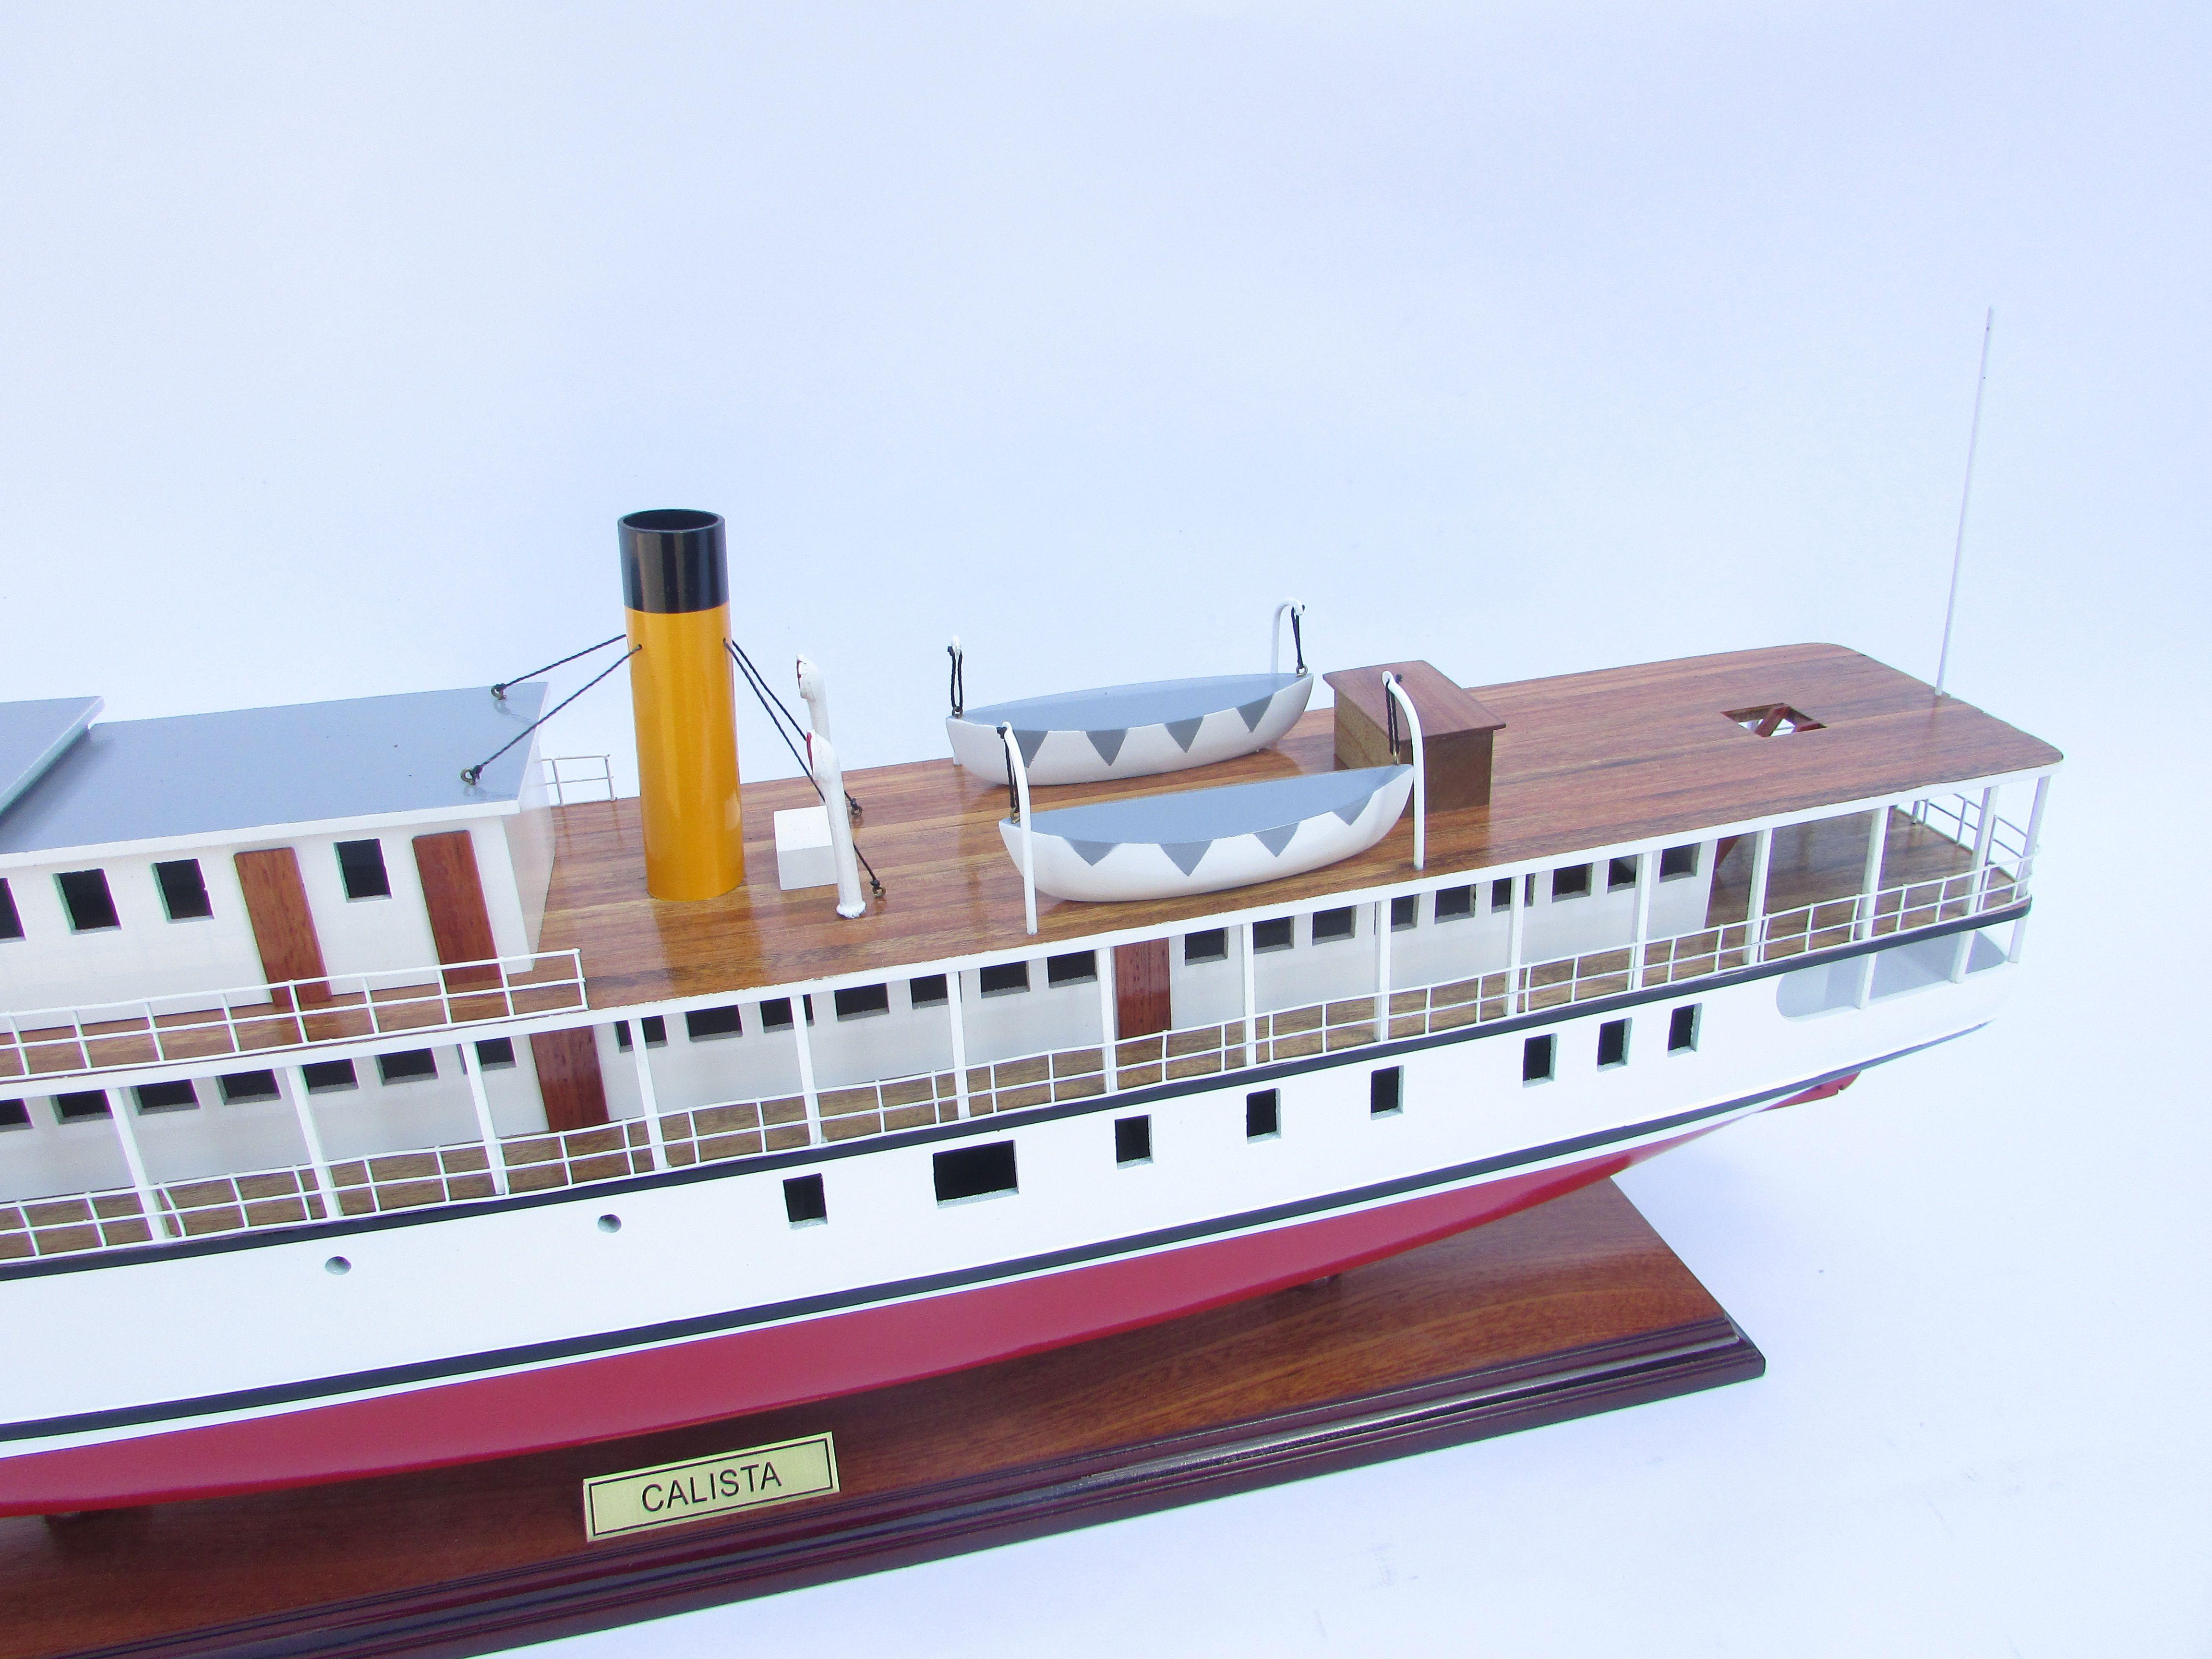 Calista Ship Model - GN (CS0151P)